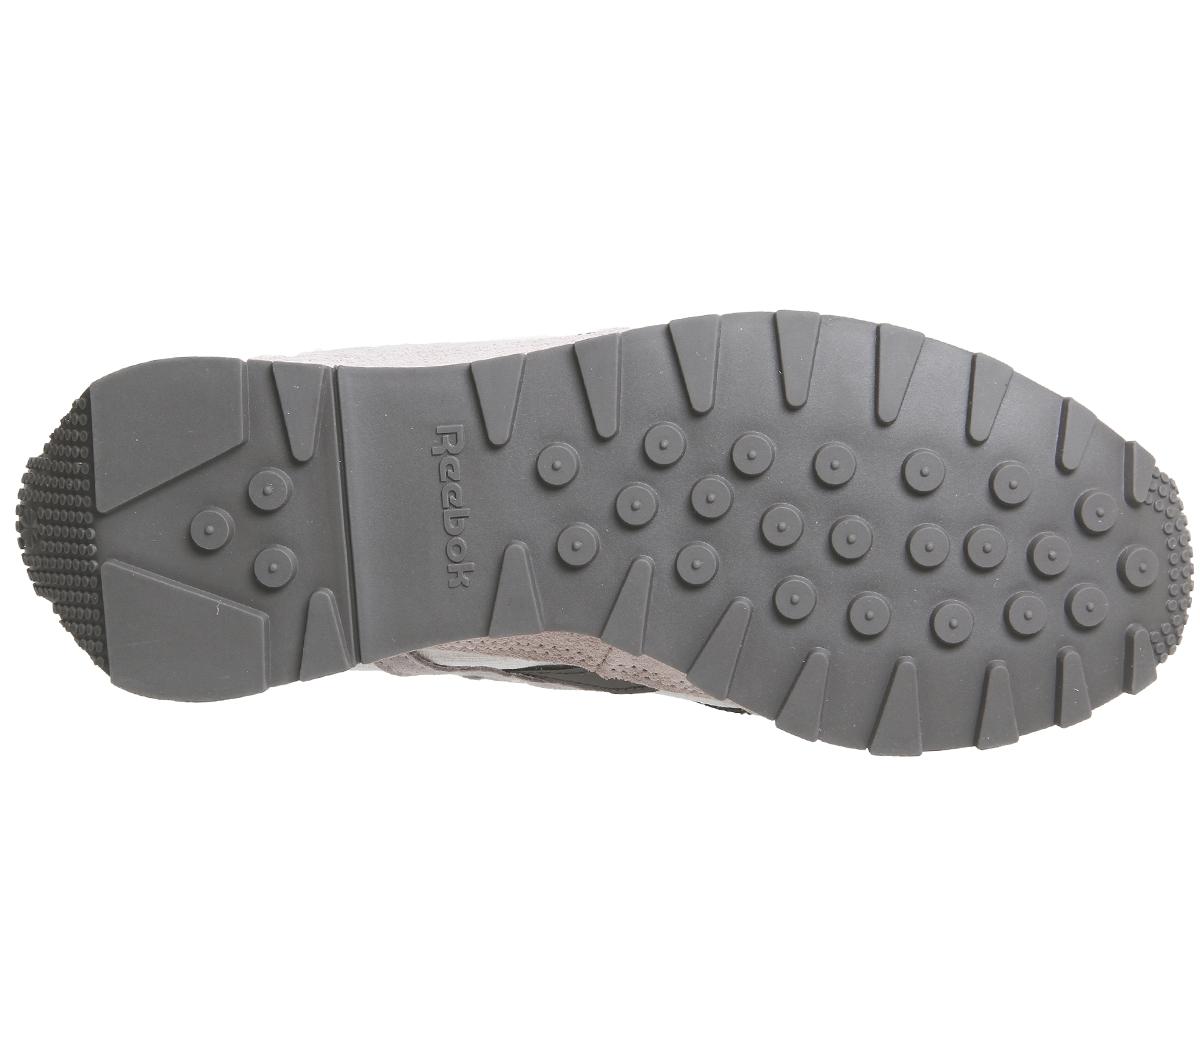 389c5aea8e0 Womens Reebok Aztec Og SHELL PINK LILAC ASH Trainers Shoes